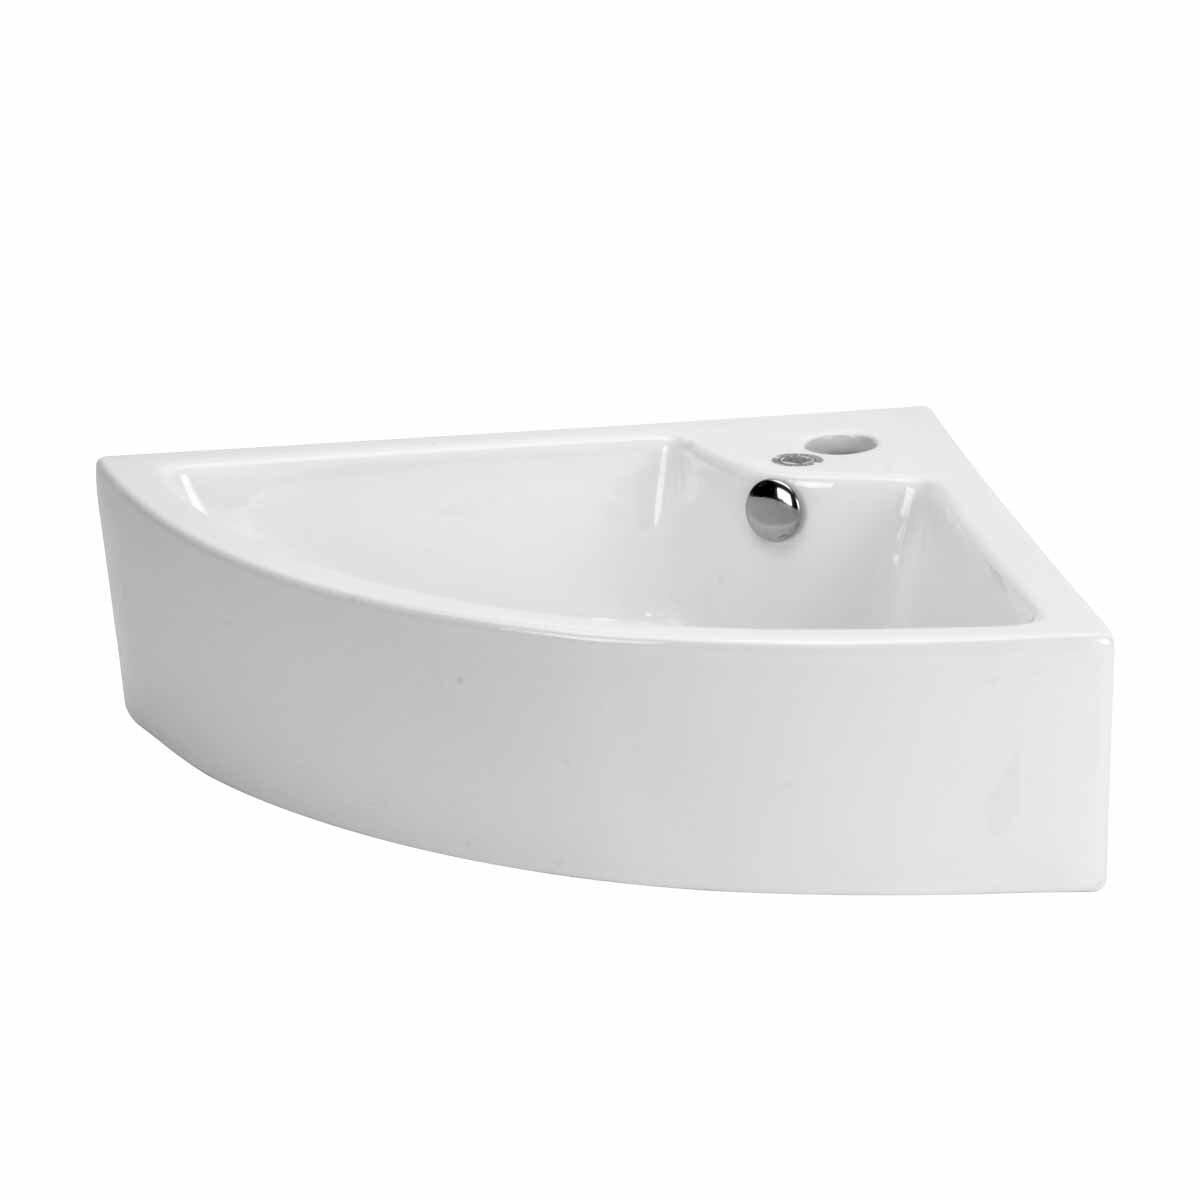 Corner Porcelain Specialty Vessel Bathroom Sink with Overflow